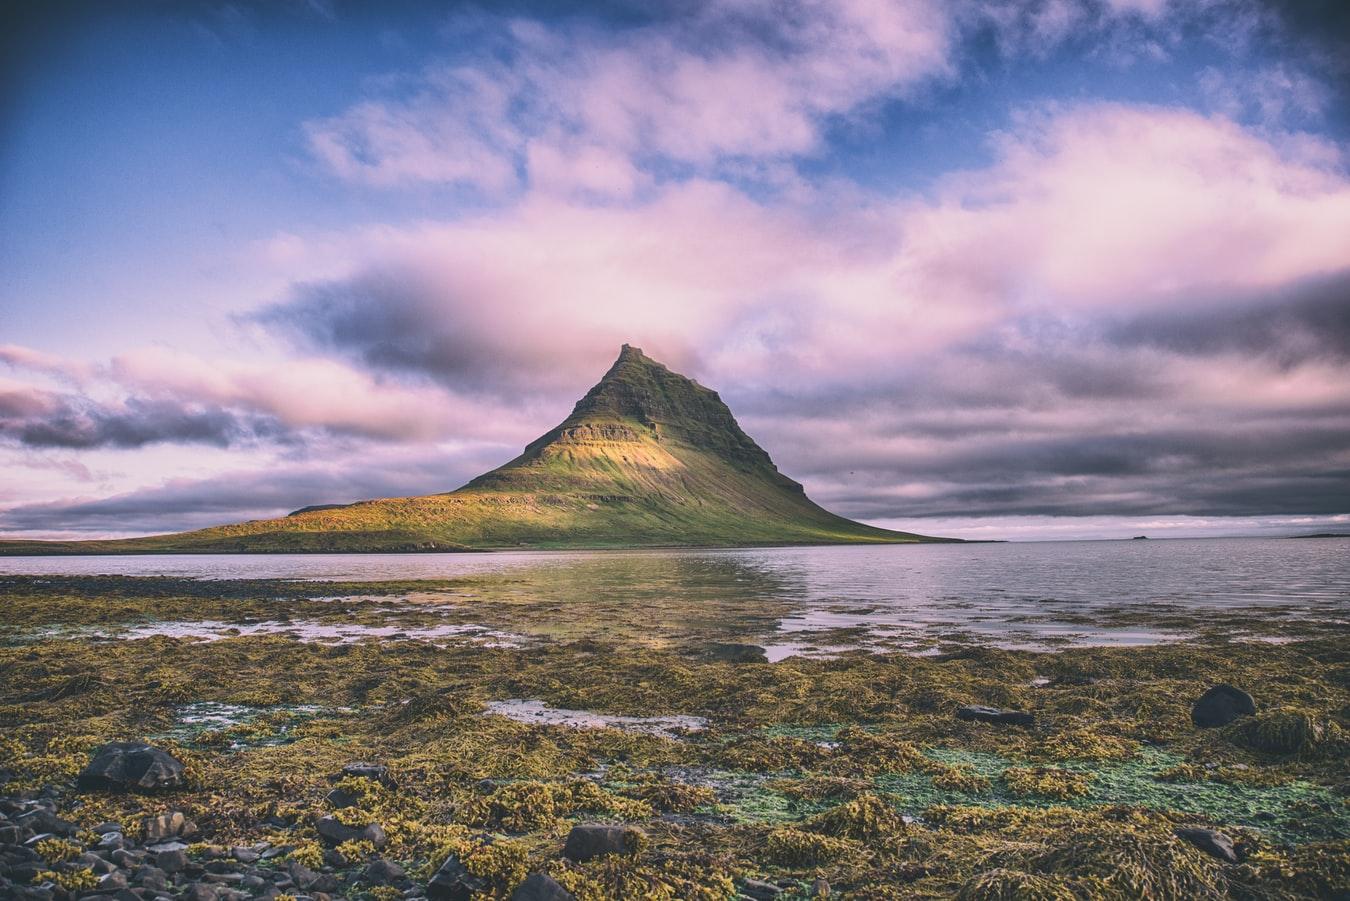 Kirkjufell mountain in Snæfellsnes Peninsula, Snæfellsnjokull National Park